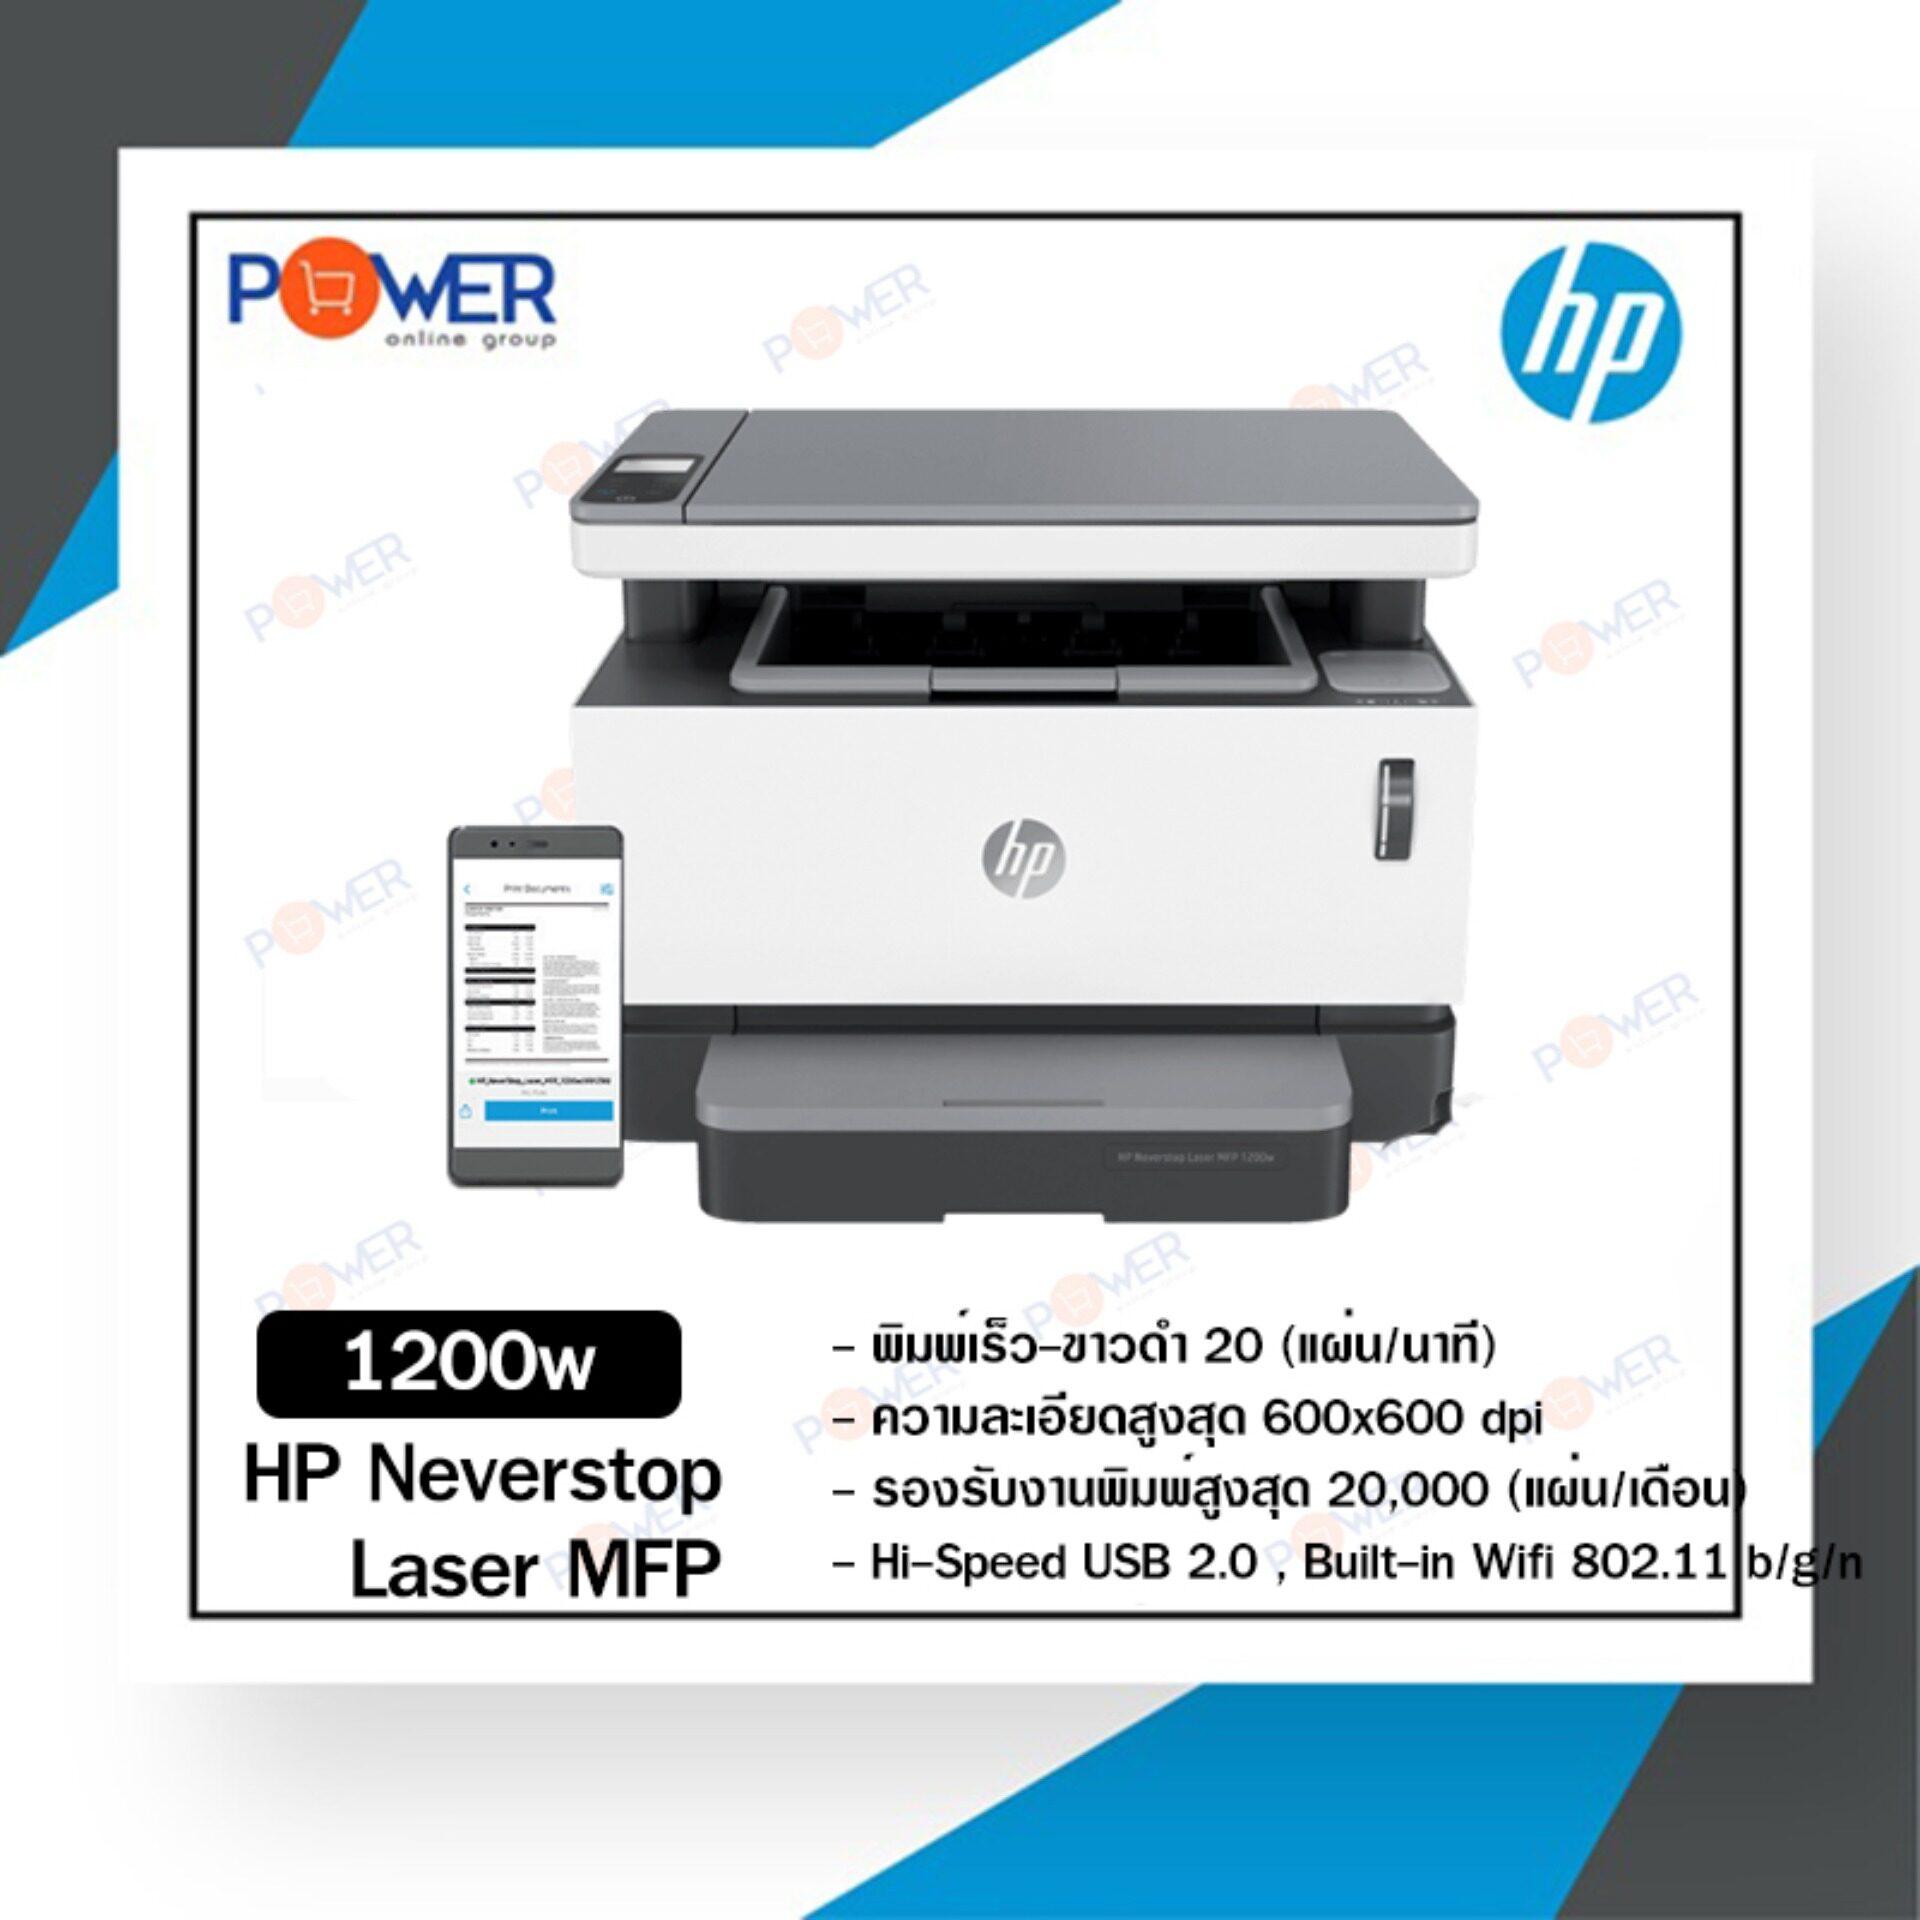 Hp Neverstop Laser Mfp 1200w (4ry26a) พร้อมหมึกแท้ (รับประกัน 1 ปี ).